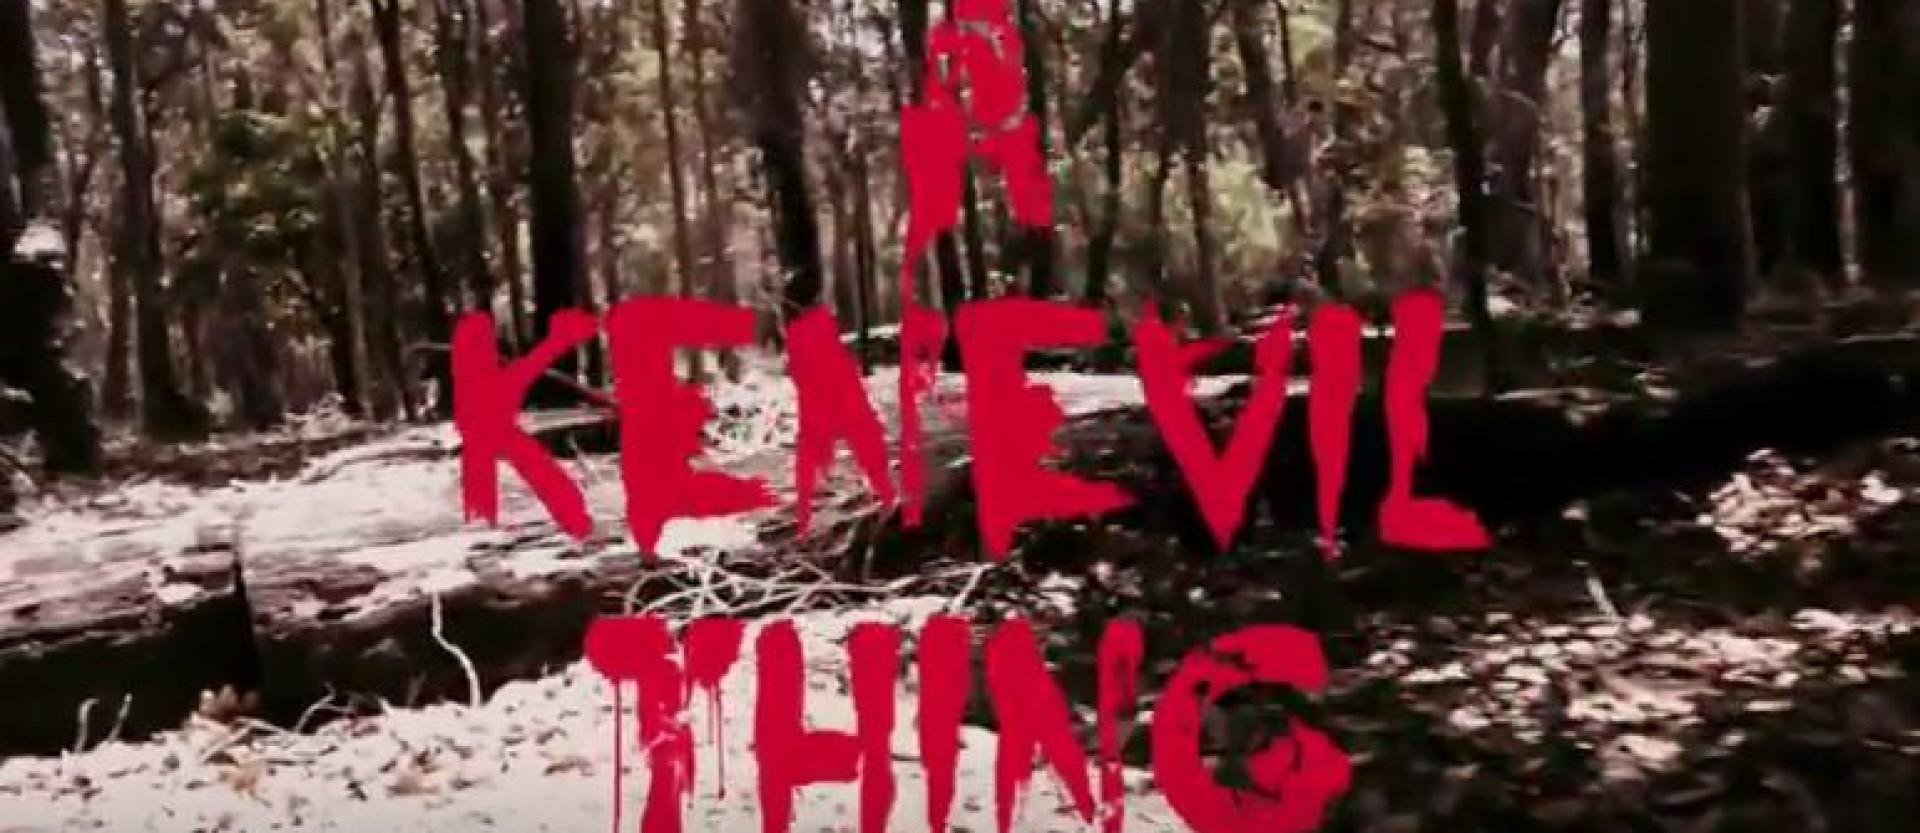 A Ken Evil Thing